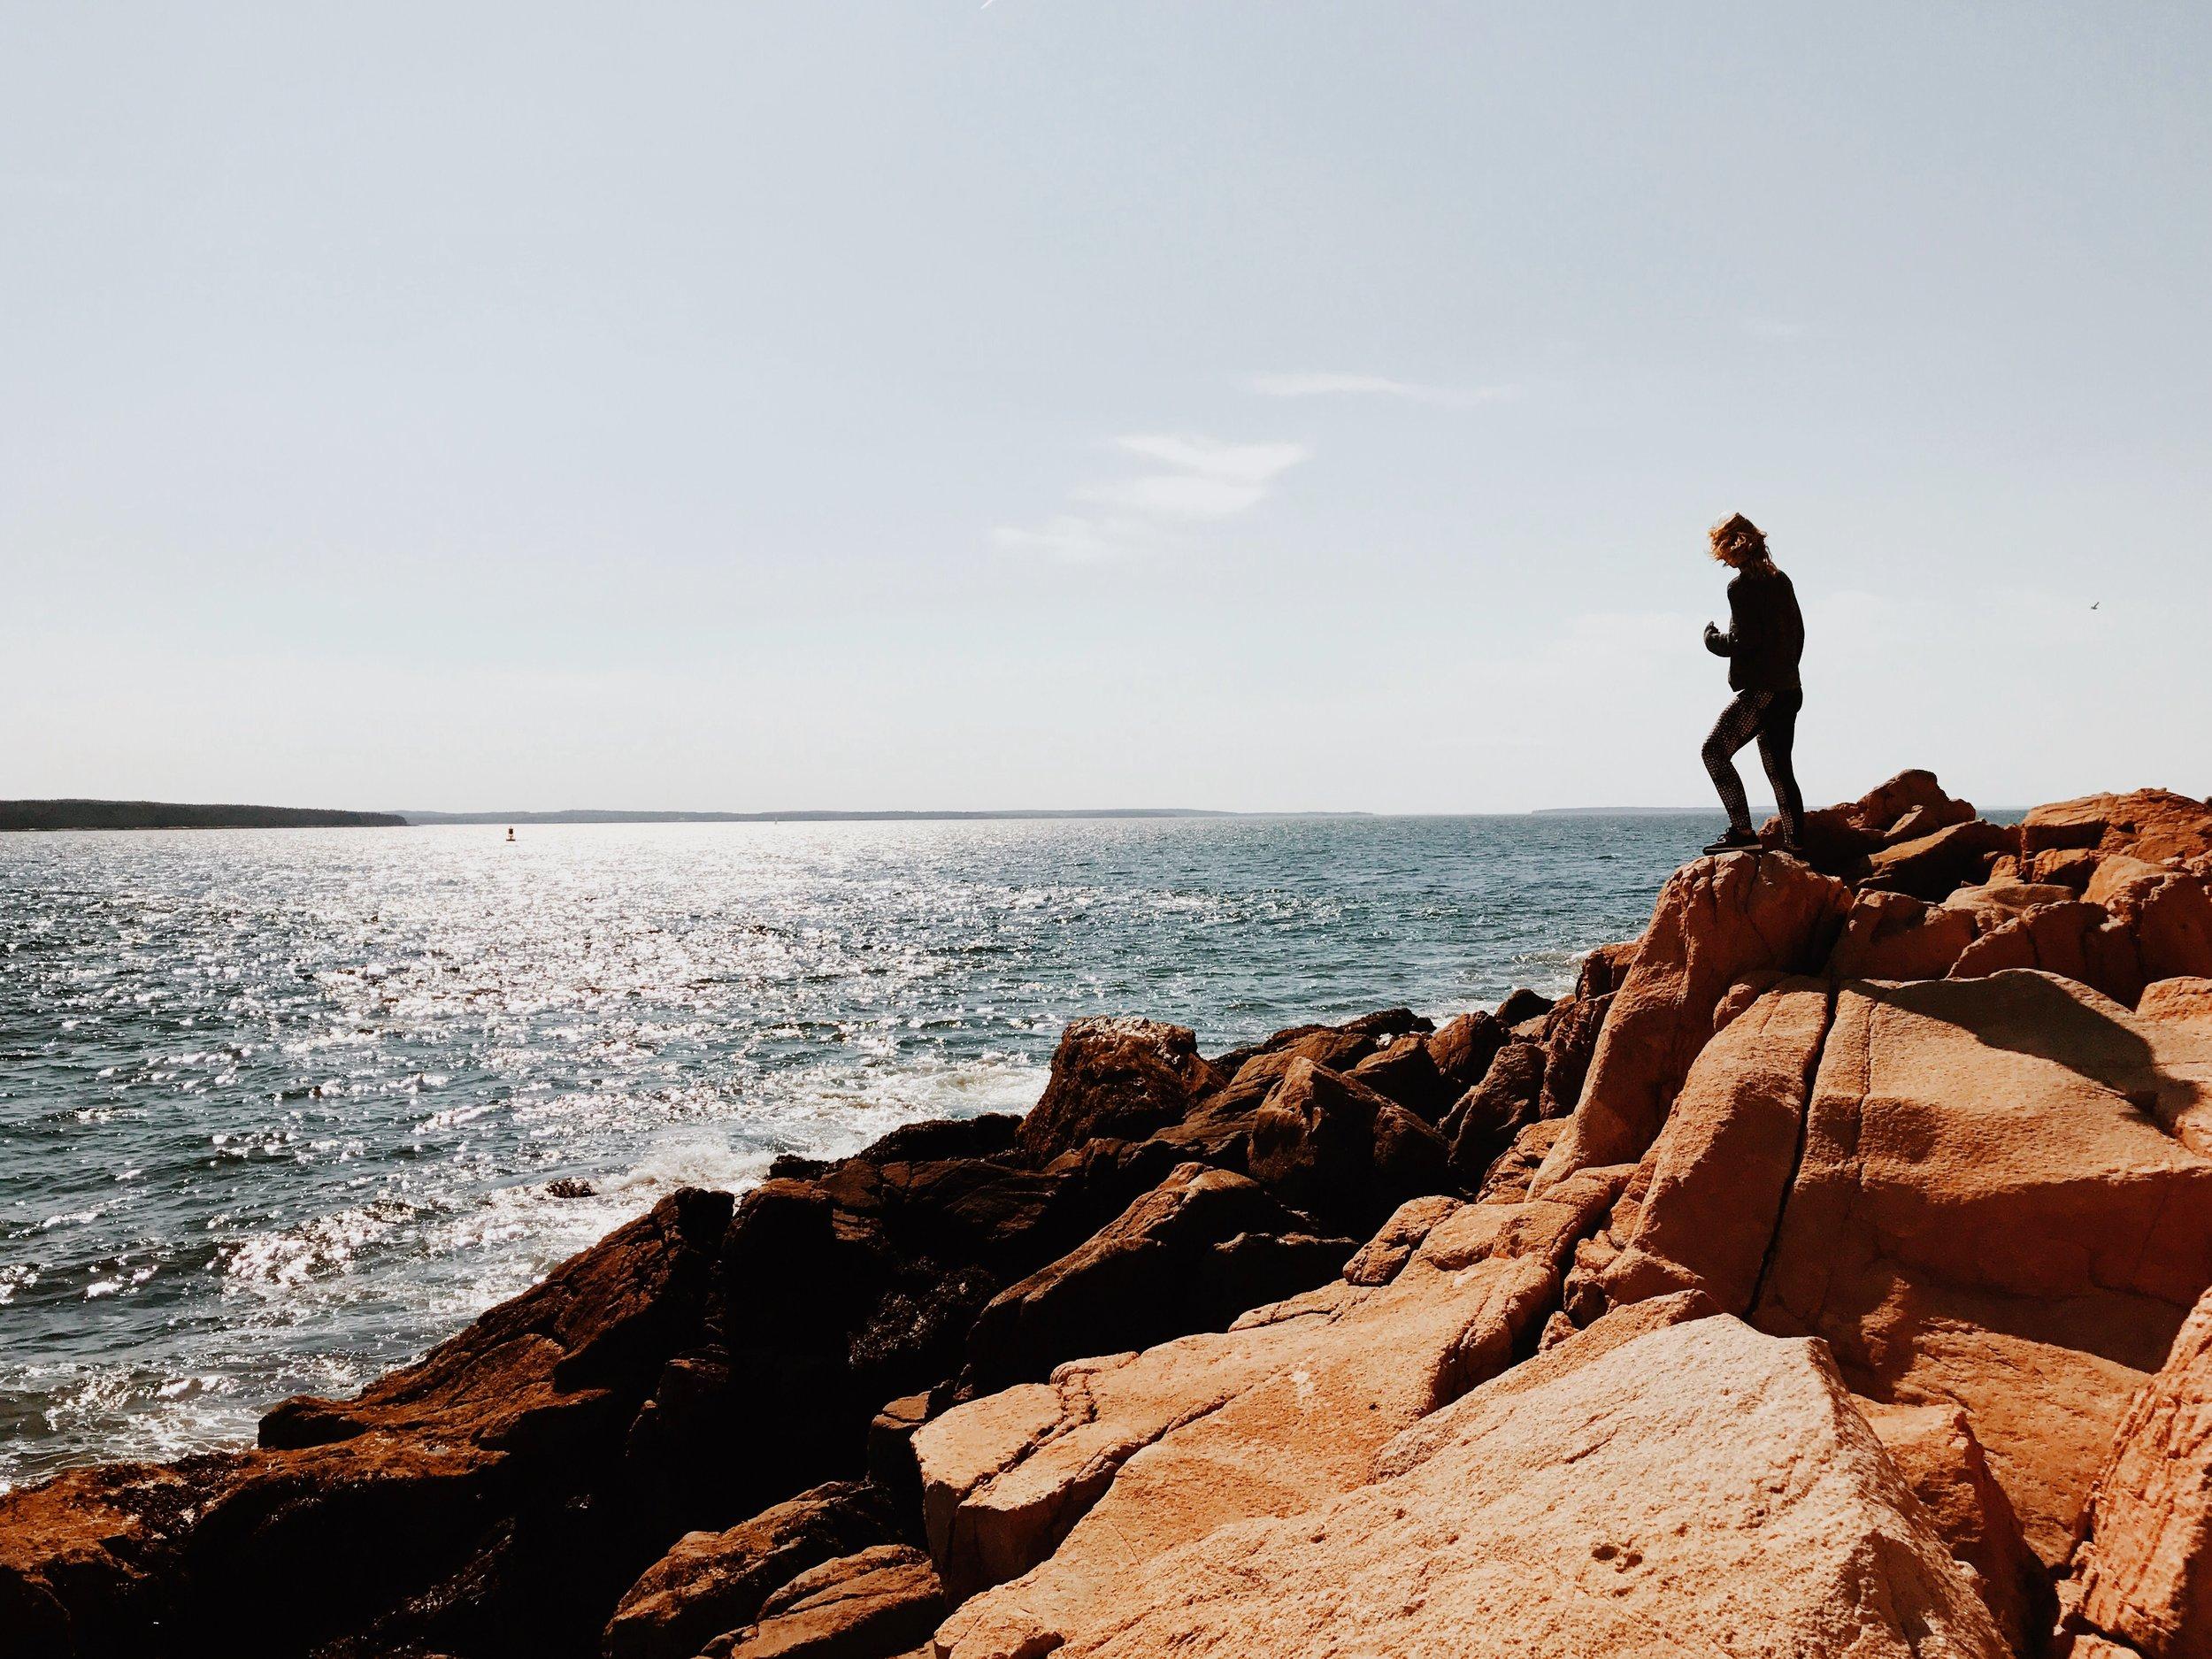 Exploring the coast of Maine